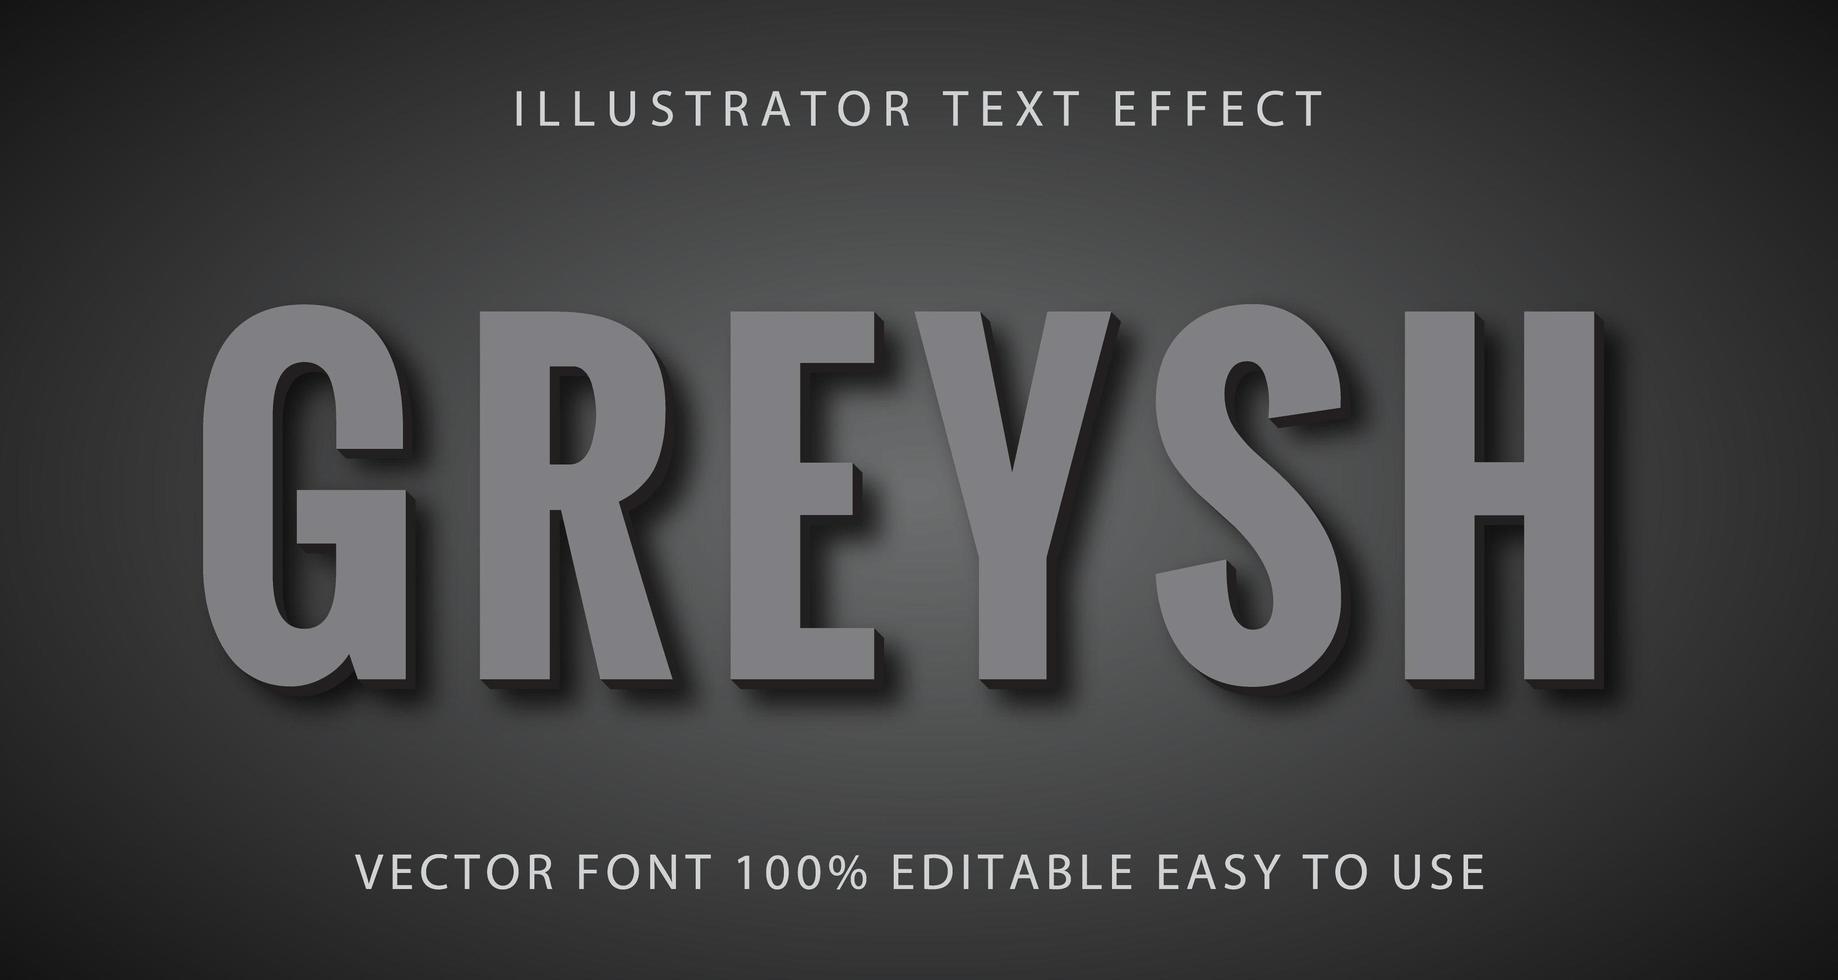 cinza cinza com efeito de texto de sombra vetor